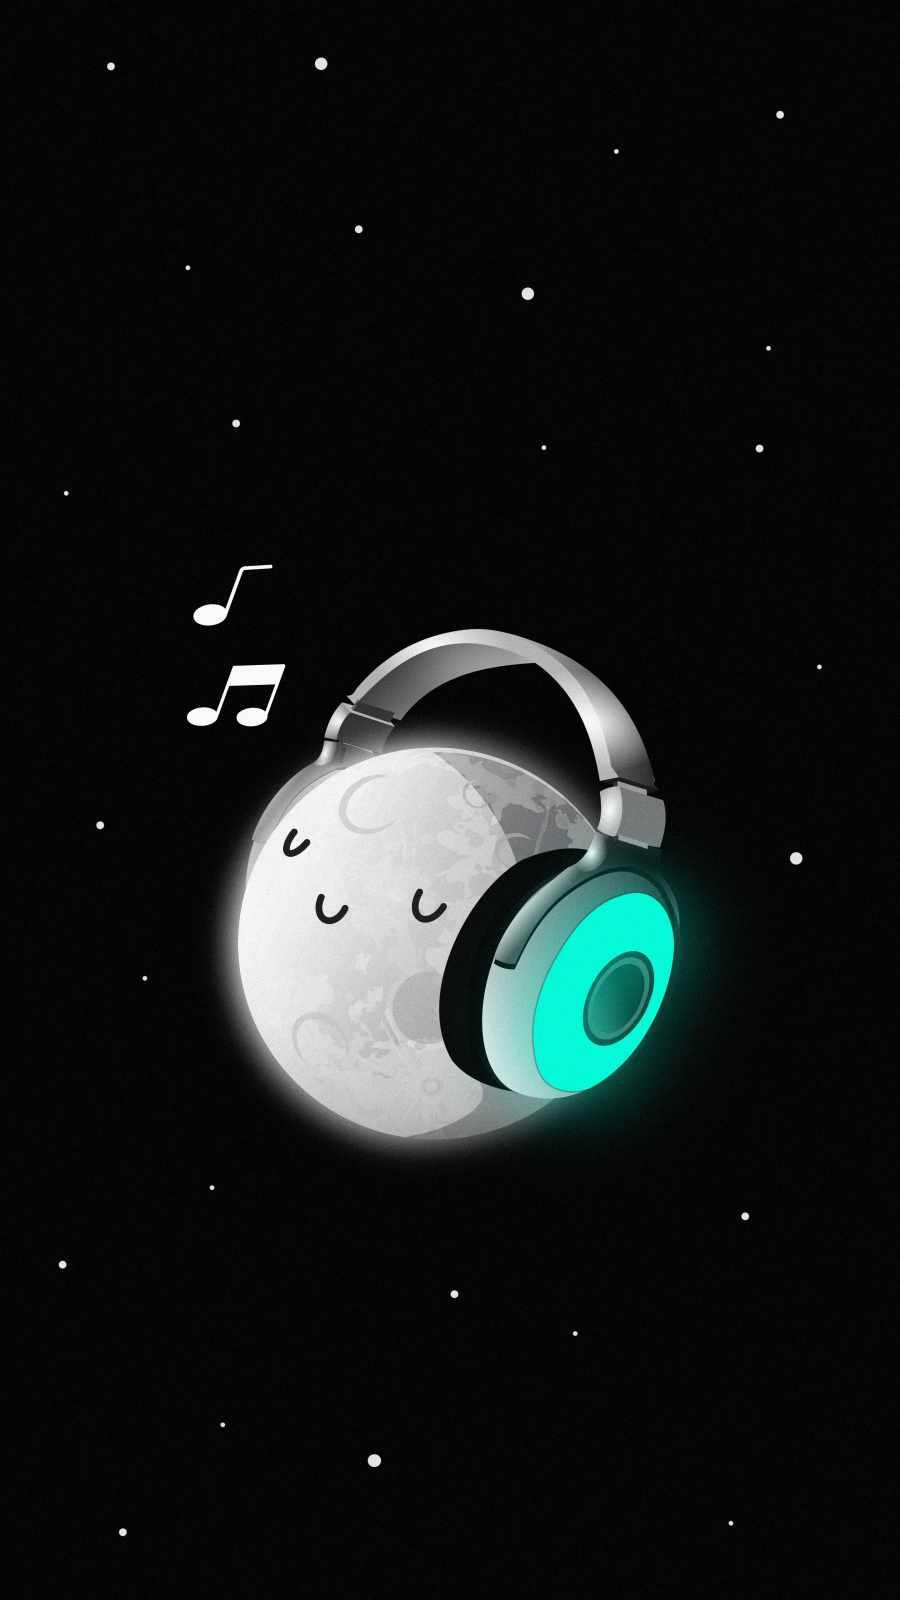 Relaxing Music iPhone Wallpaper